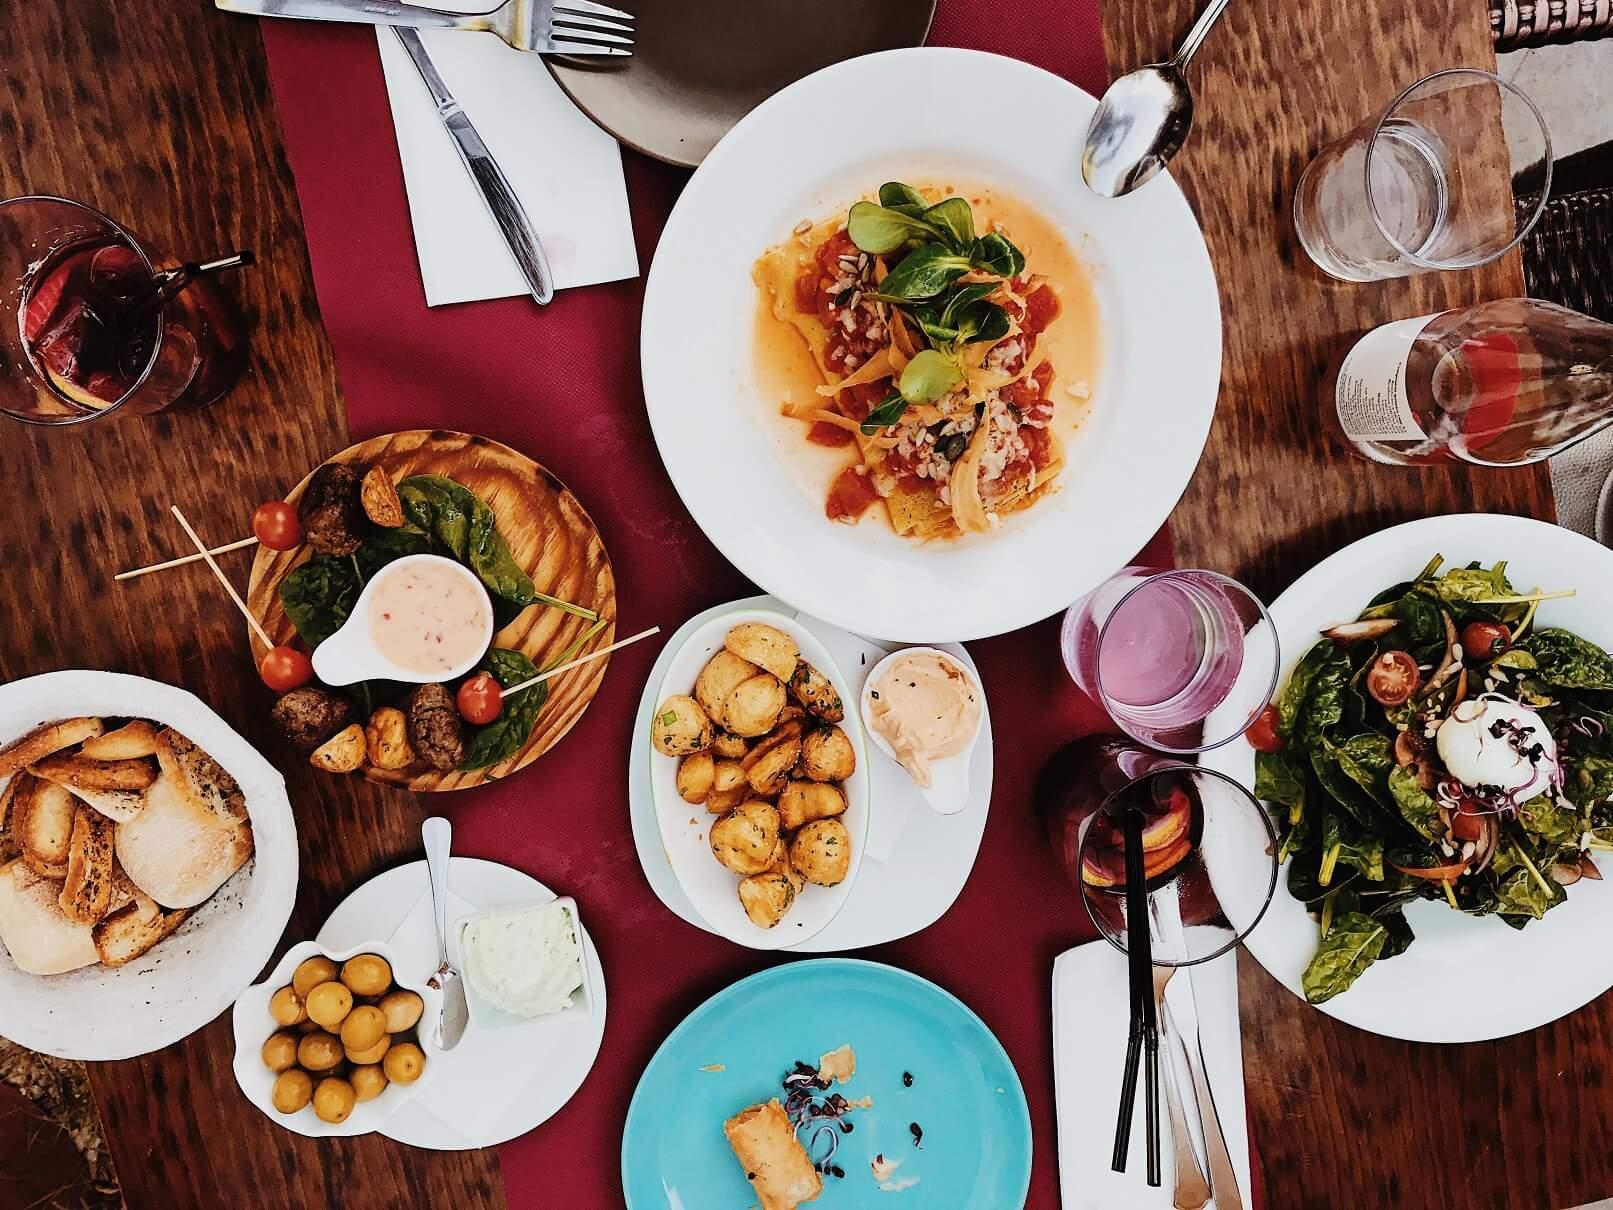 kombinacija namirnica-kako jesti manje za vreme praznika-kako jesti manje-obilni obroci-zdrava hrana-kombinacija jela-kieslost organizna-sturčni savet-stručni saveti-dr. gifing-iceberg salat centar-klub zdravih navika